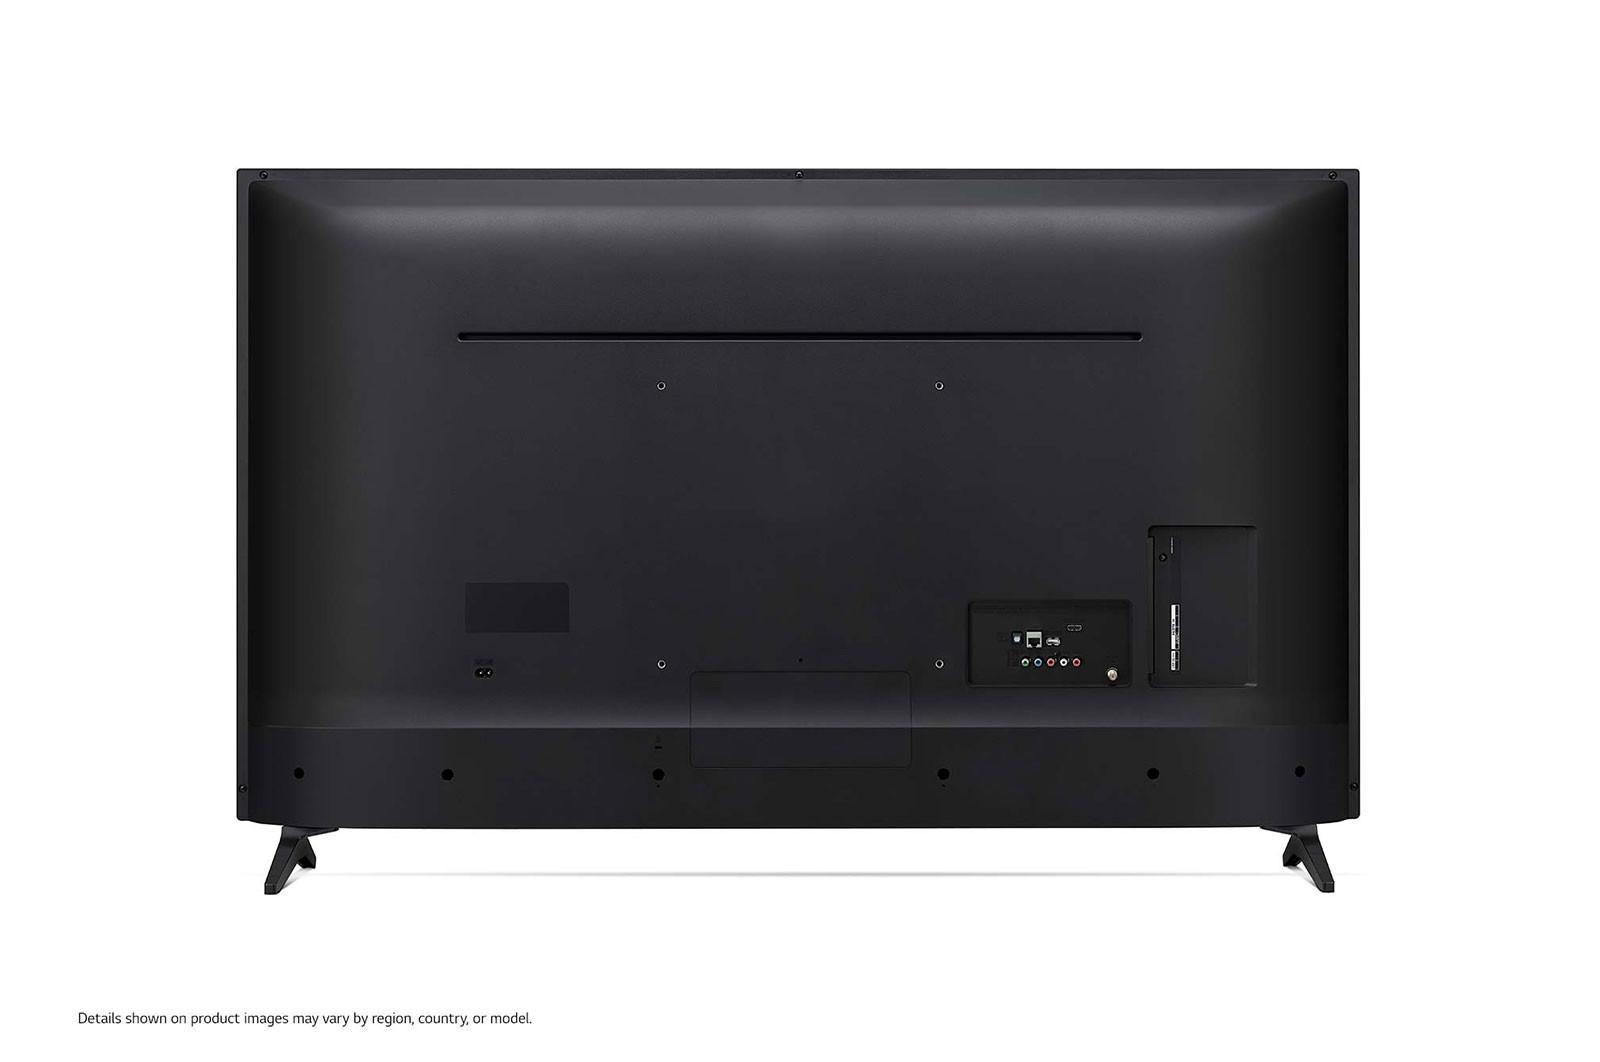 Smart Tivi 4K 55 inch LG 55UM7100PTA ThinQ AI